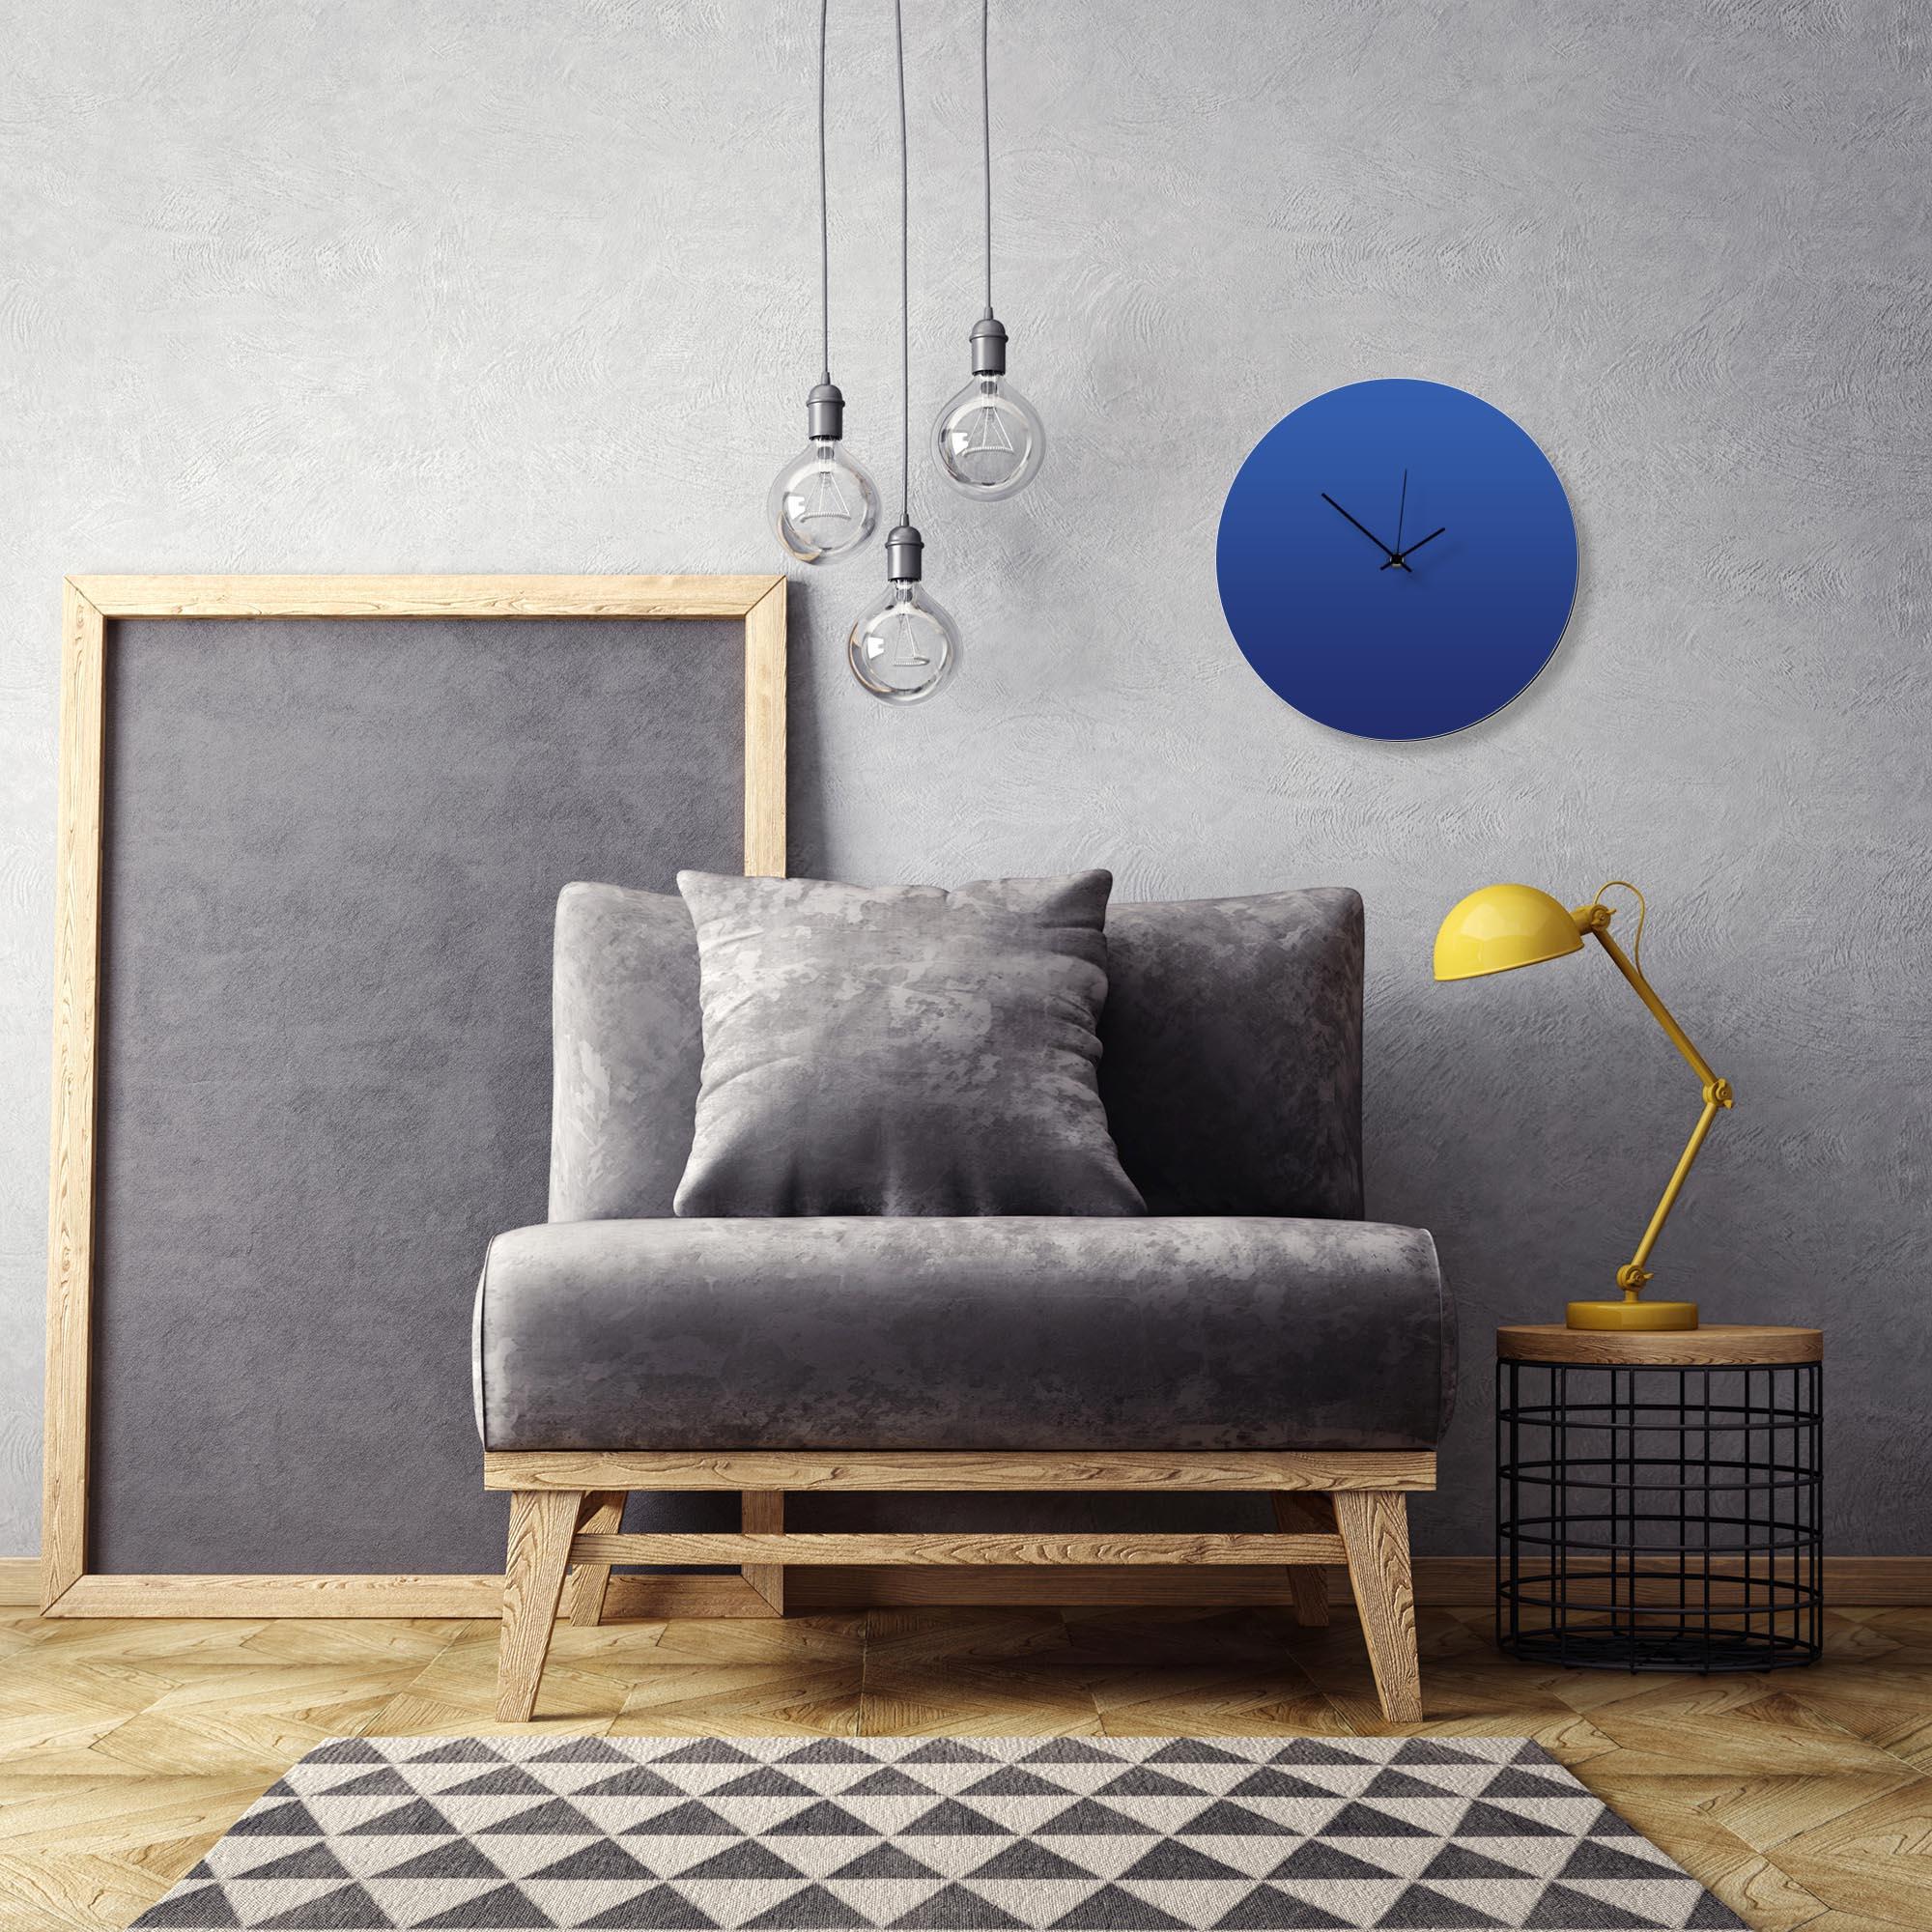 Blueout Black Circle Clock by Adam Schwoeppe Contemporary Clock on Aluminum Polymetal - Alternate View 1